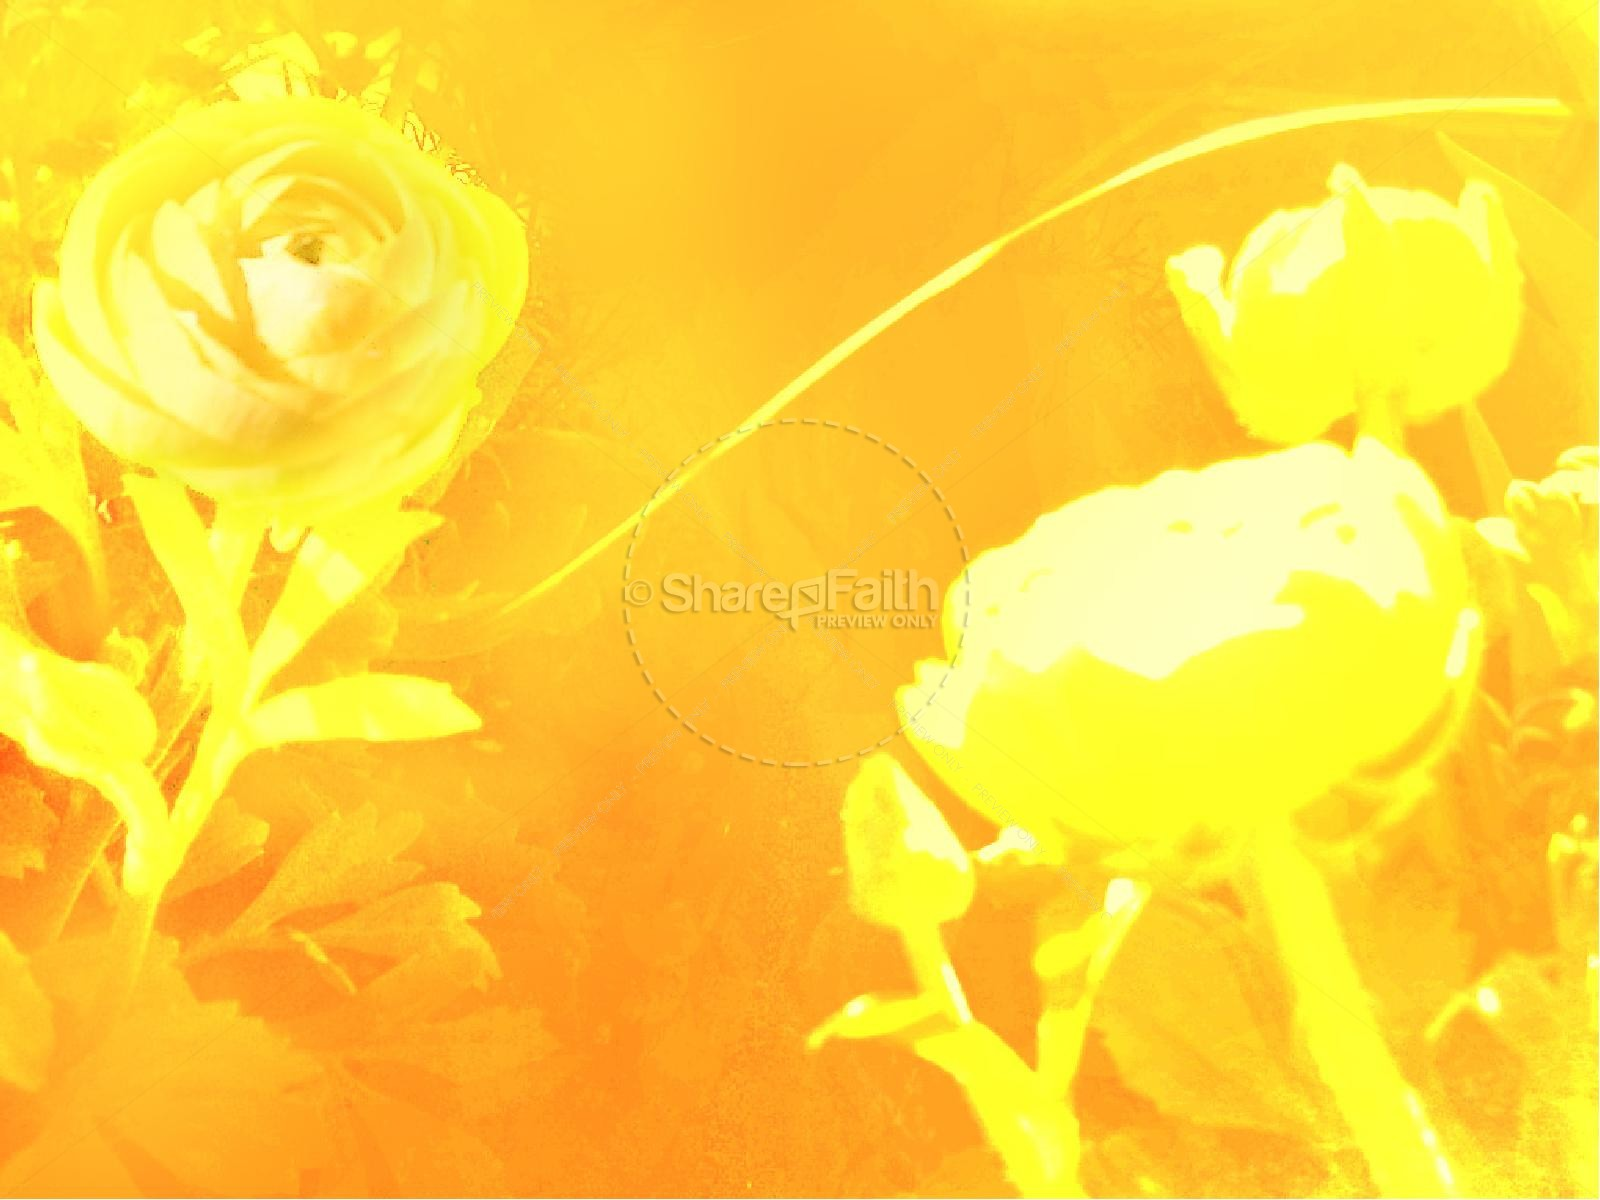 Yellow spring flower crossword clue flowers healthy plant with yellow flowers crossword images flower decoration ideas yellow spring flowers crossword clue beautiful flower 2018 mightylinksfo